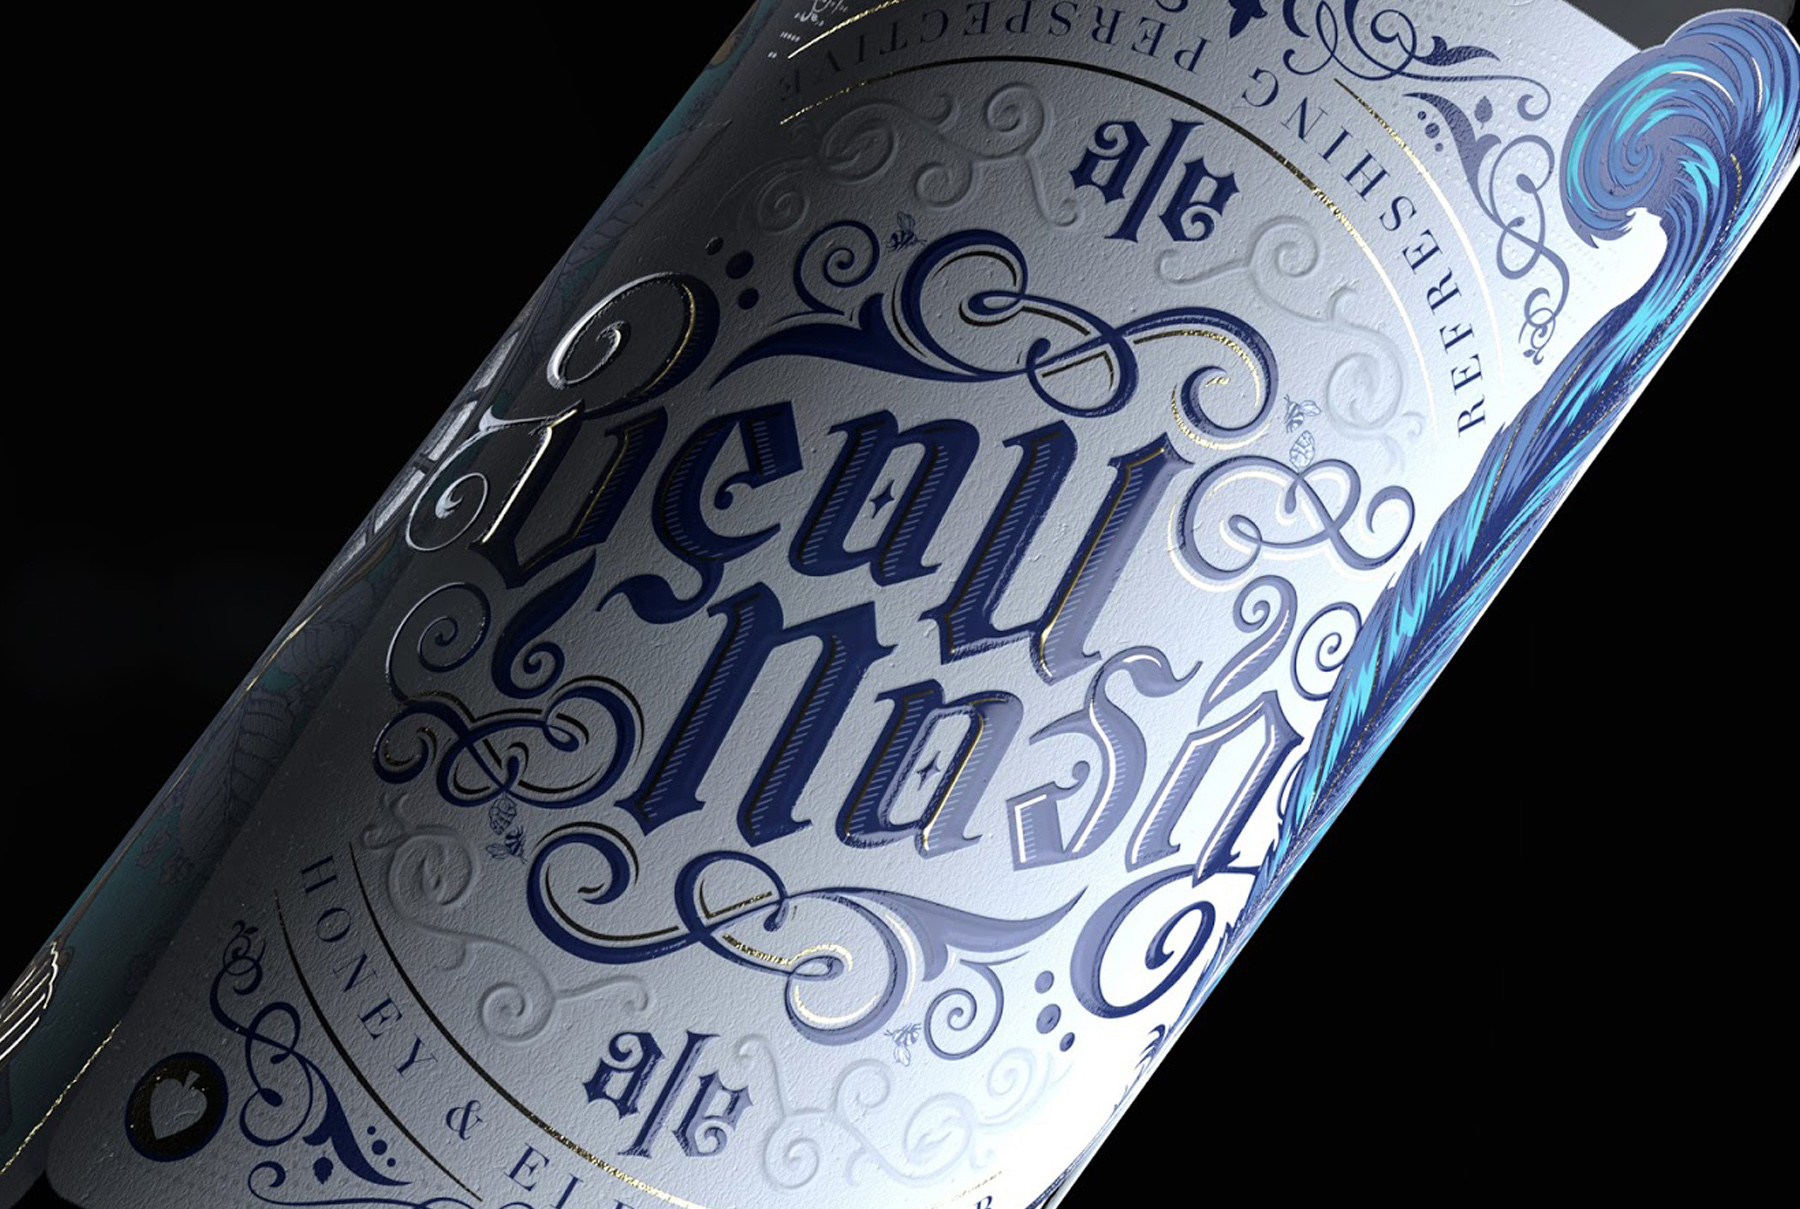 Beau Nash - bottle label